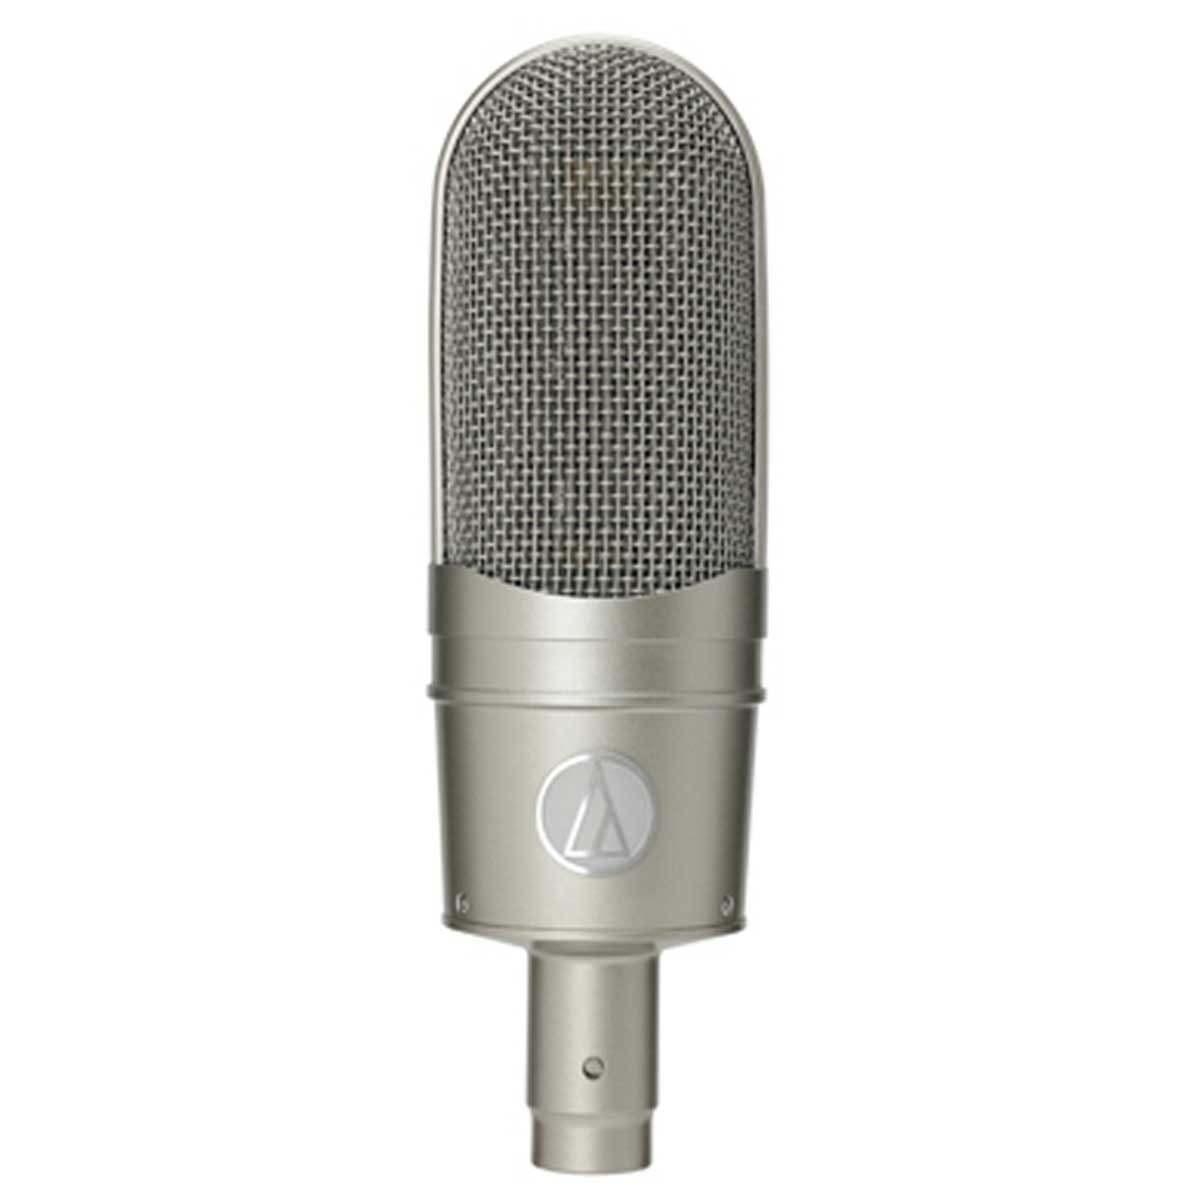 audio-technica オーディオテクニカ / AT4080 双指向性リボンマイクロホン (ショックマウント:AT8449a/SV付属)